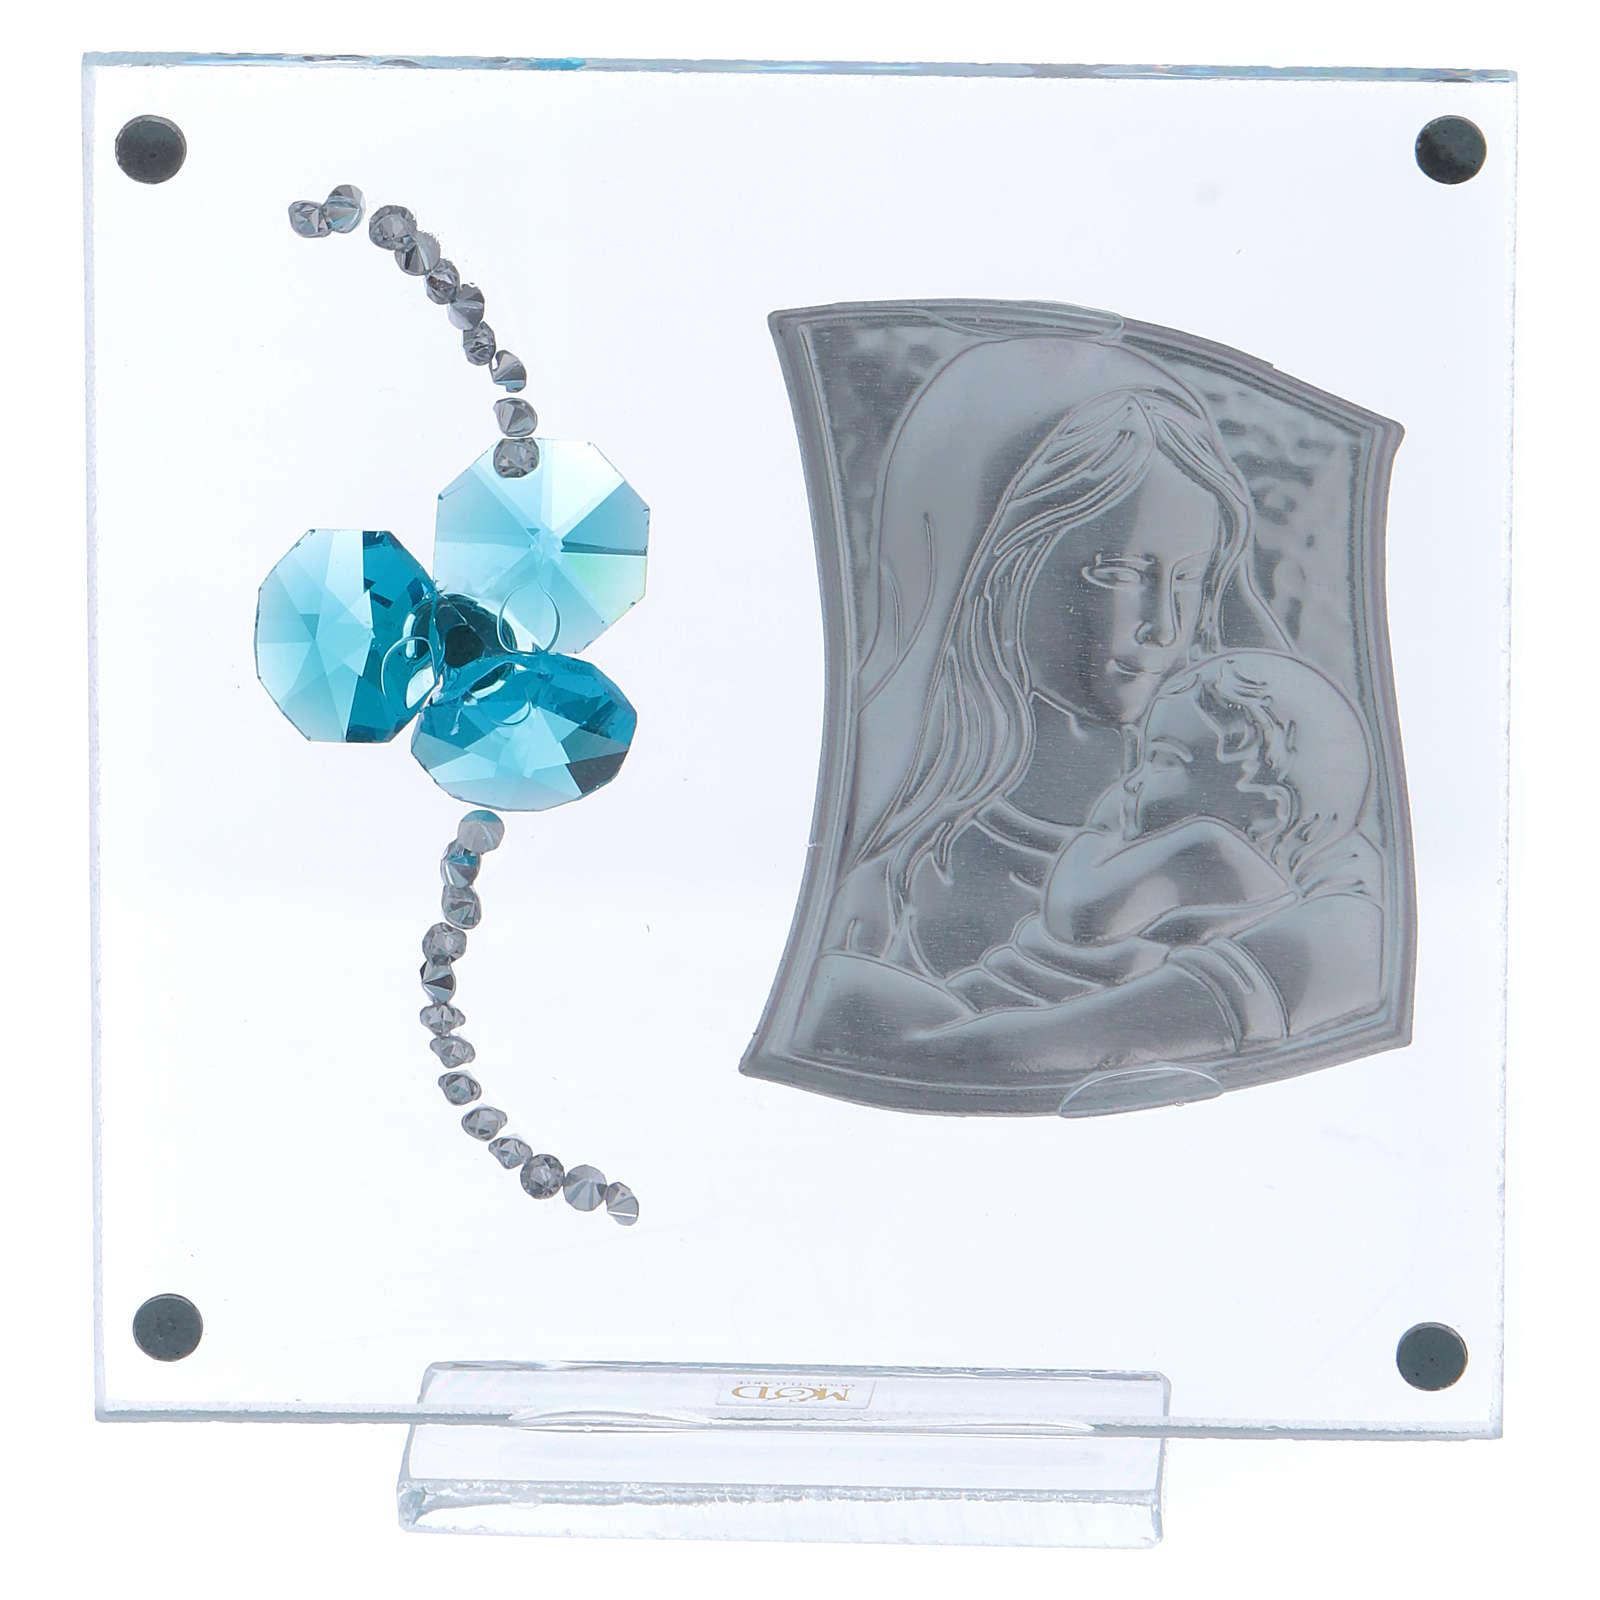 Bombonera Bautismo trébol aguamarina imagen Maternidad 10x10 cm 3